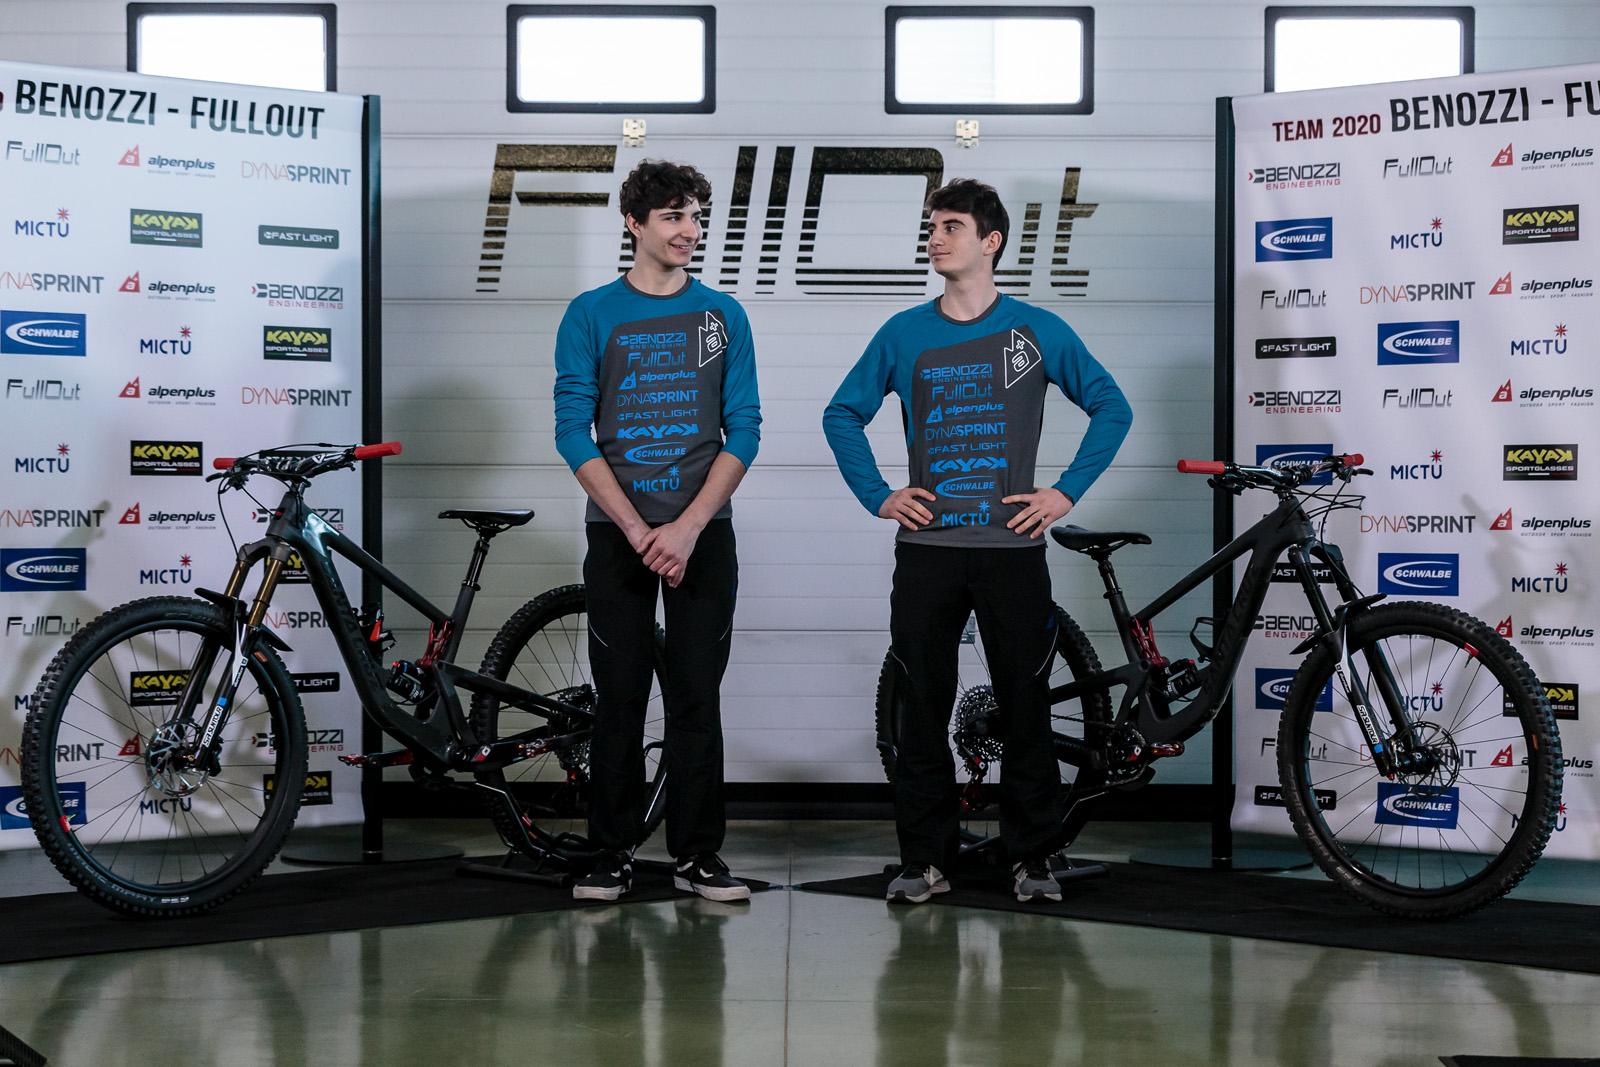 Team Benozzi-Fullout - atleti